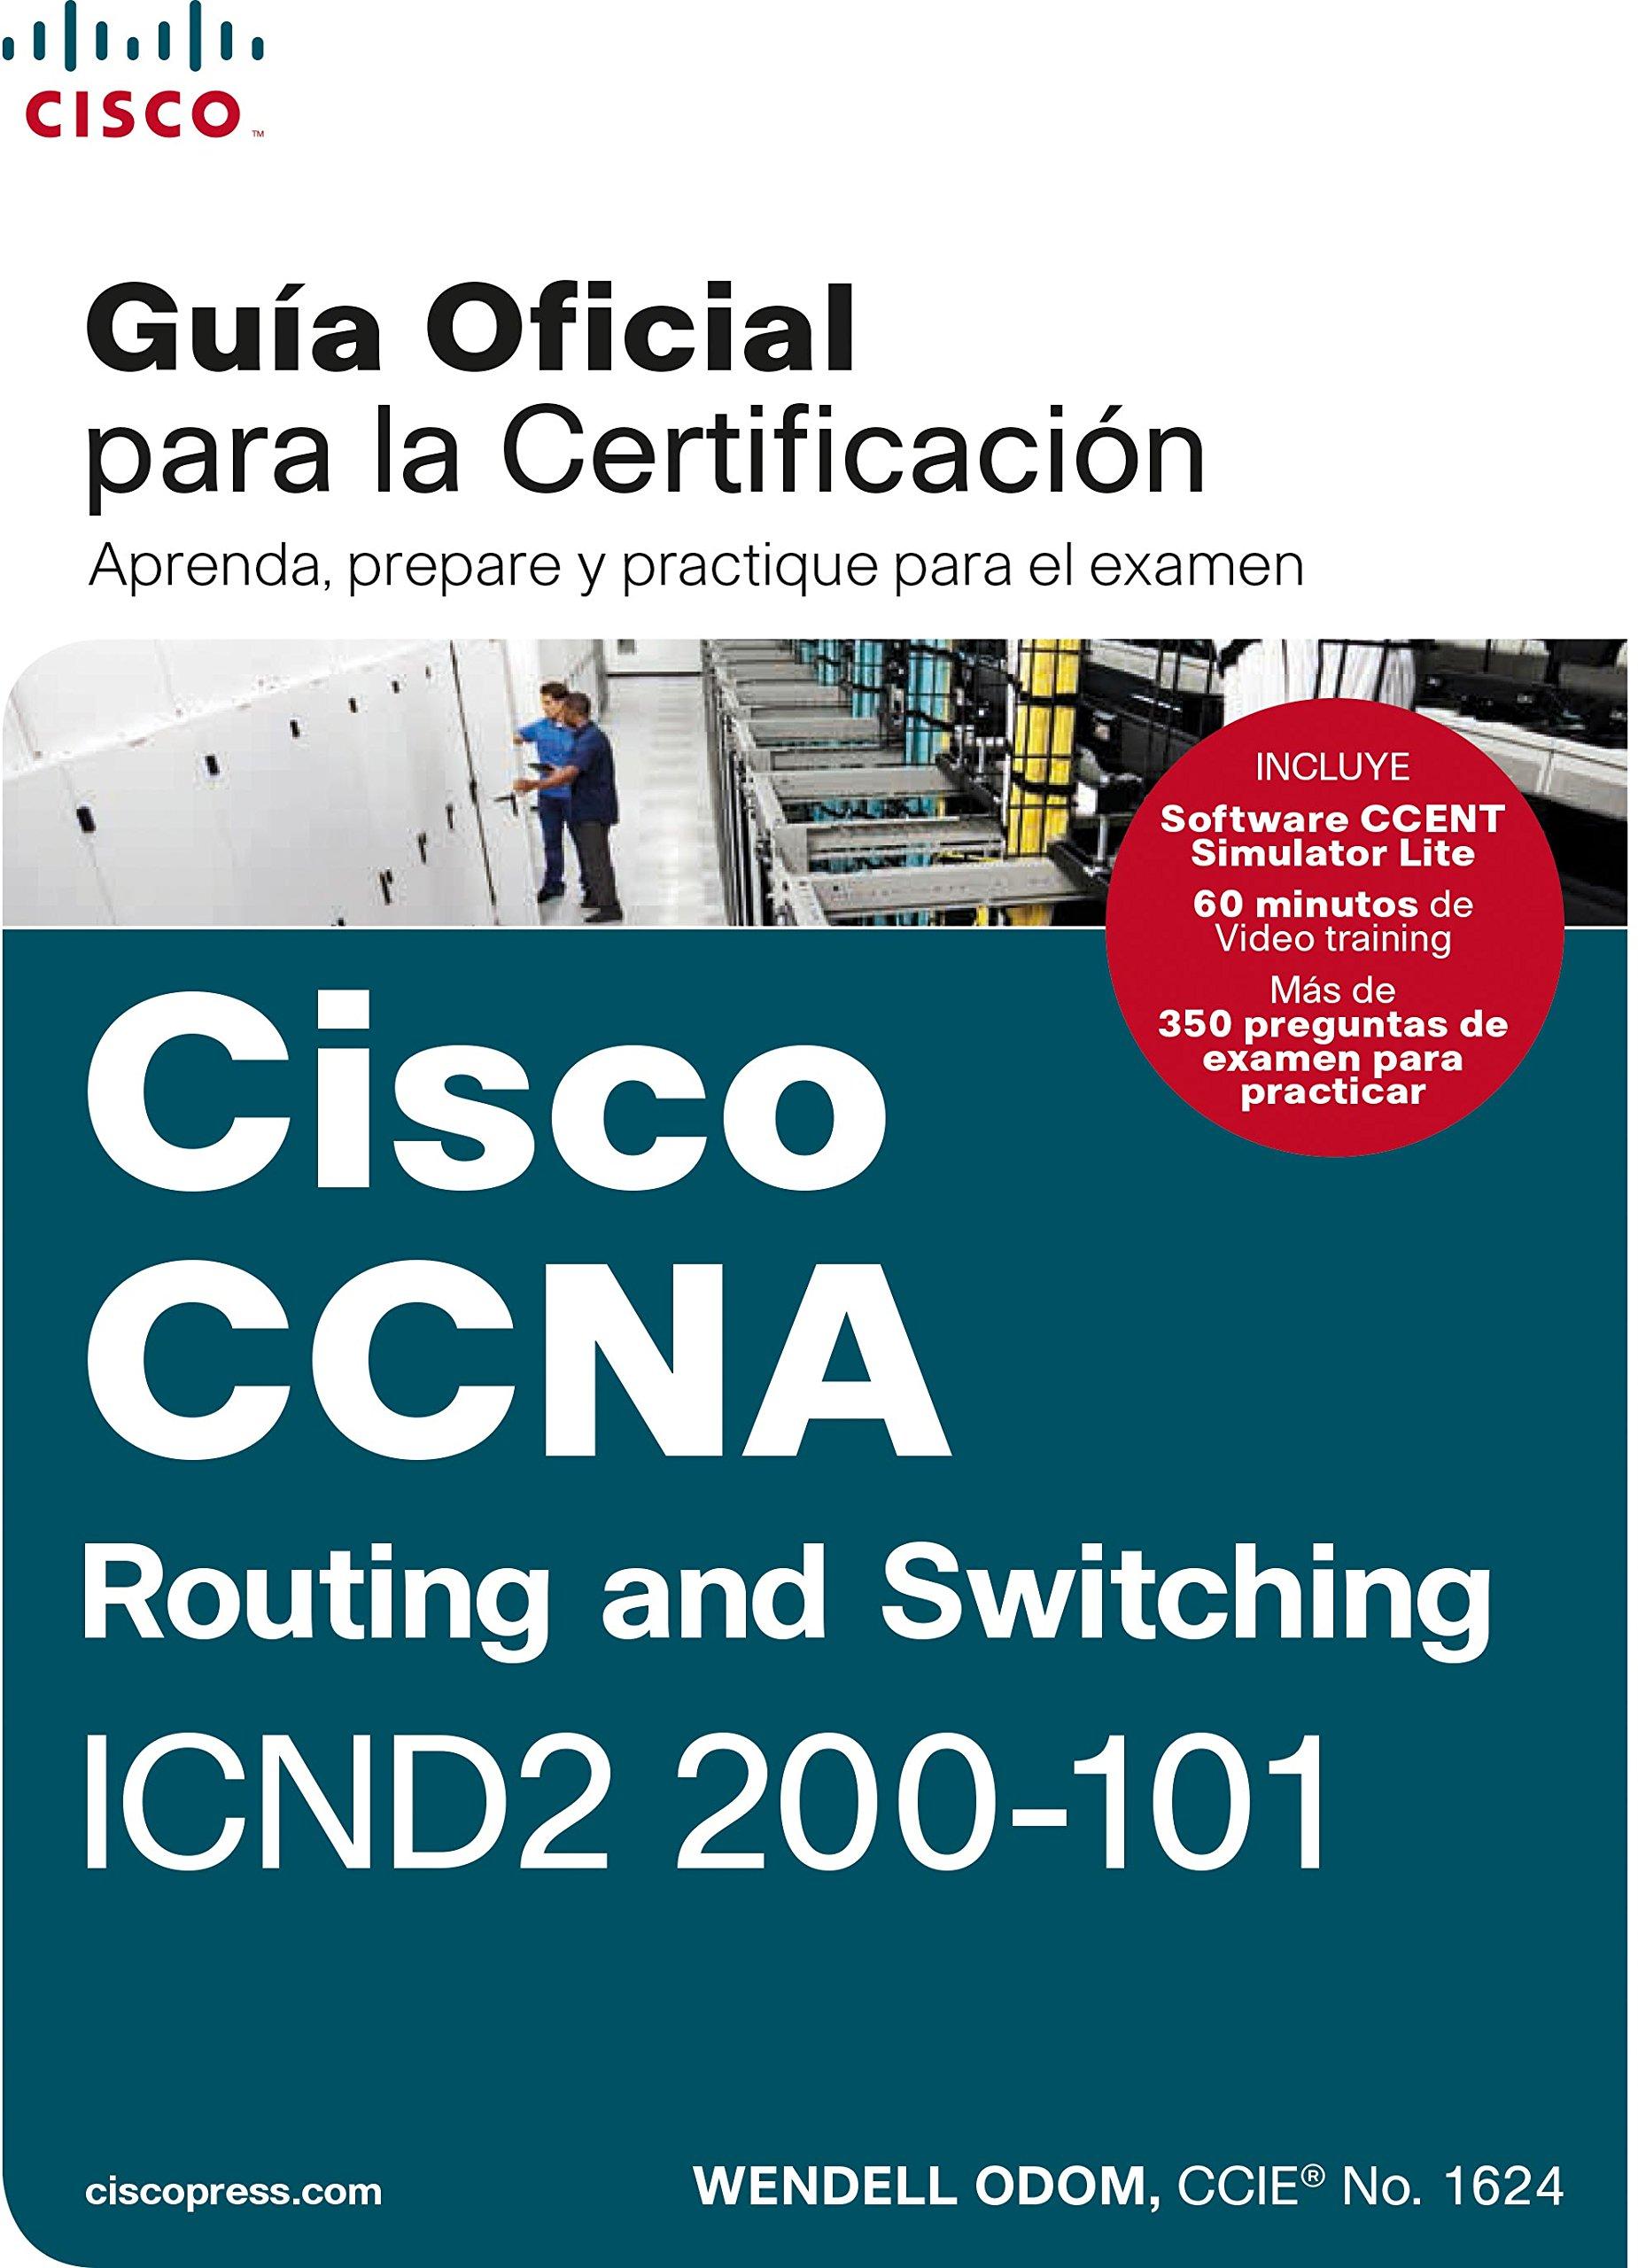 CCNA Rout&Switch 200-101: Guía examen certificación (Cisco Press) Tapa blanda – 30 may 2014 Wendell Odom Pearson 8490354731